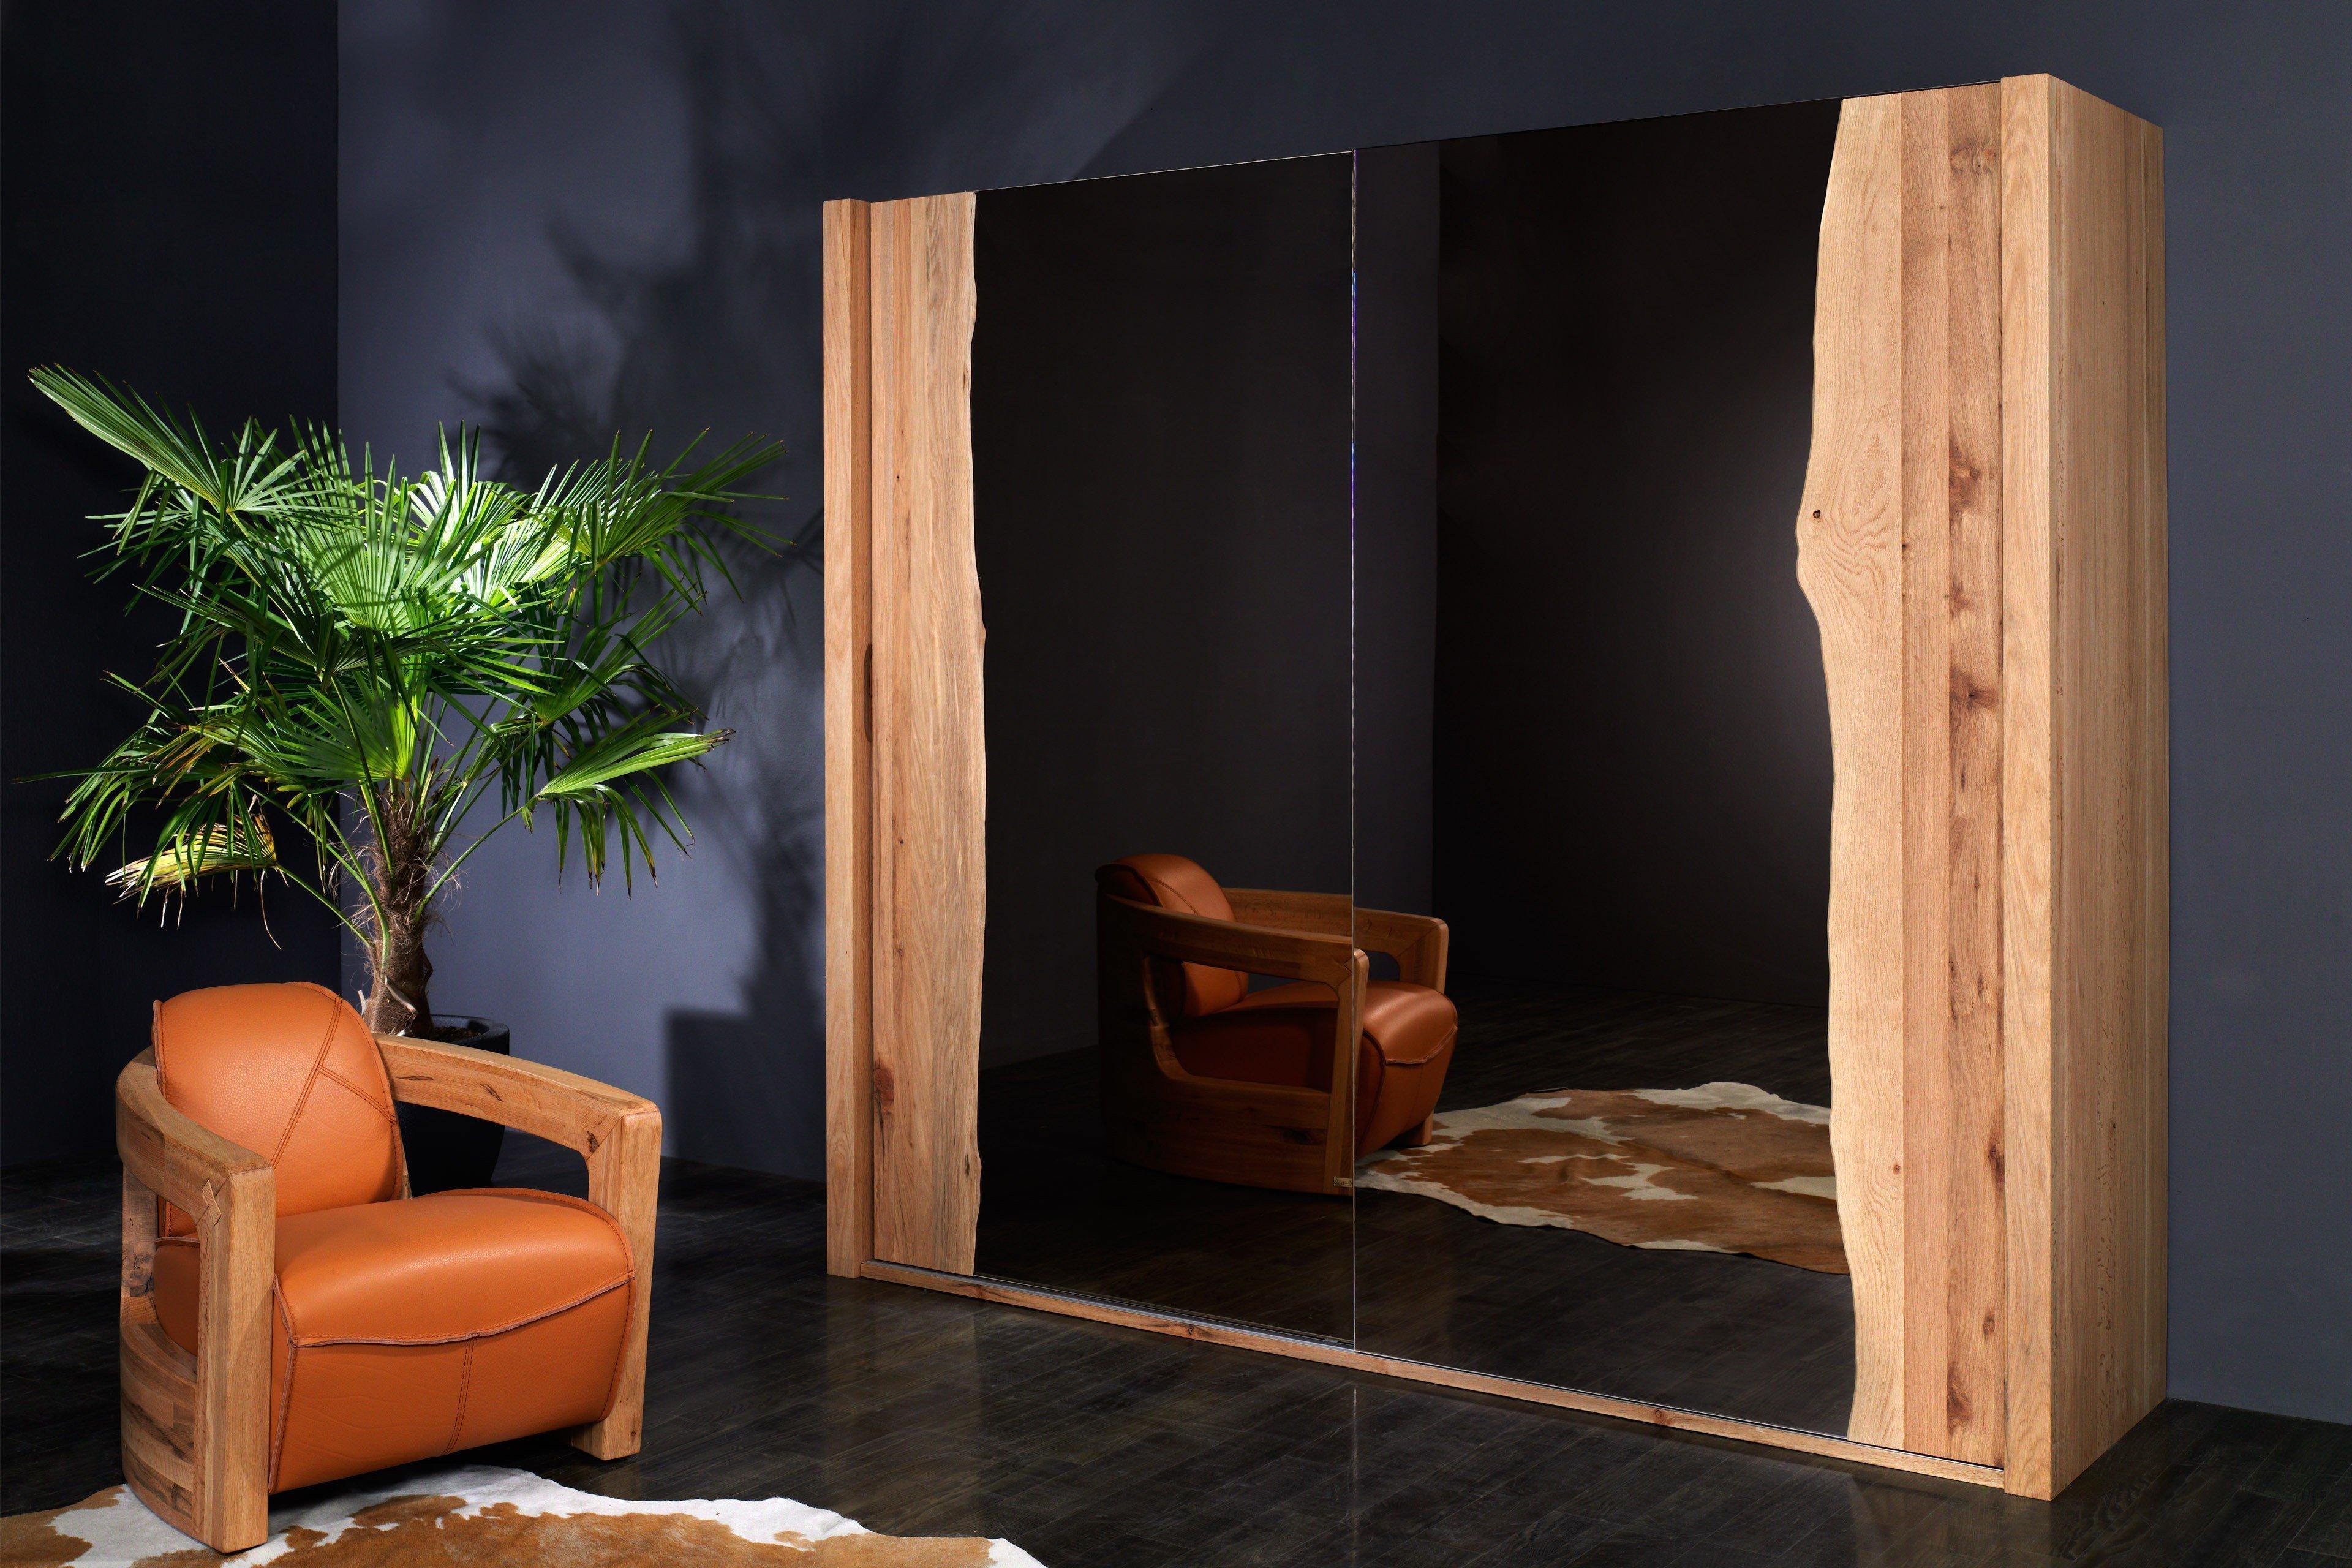 sprenger m bel kleiderschrank waldkante m bel letz ihr online shop. Black Bedroom Furniture Sets. Home Design Ideas